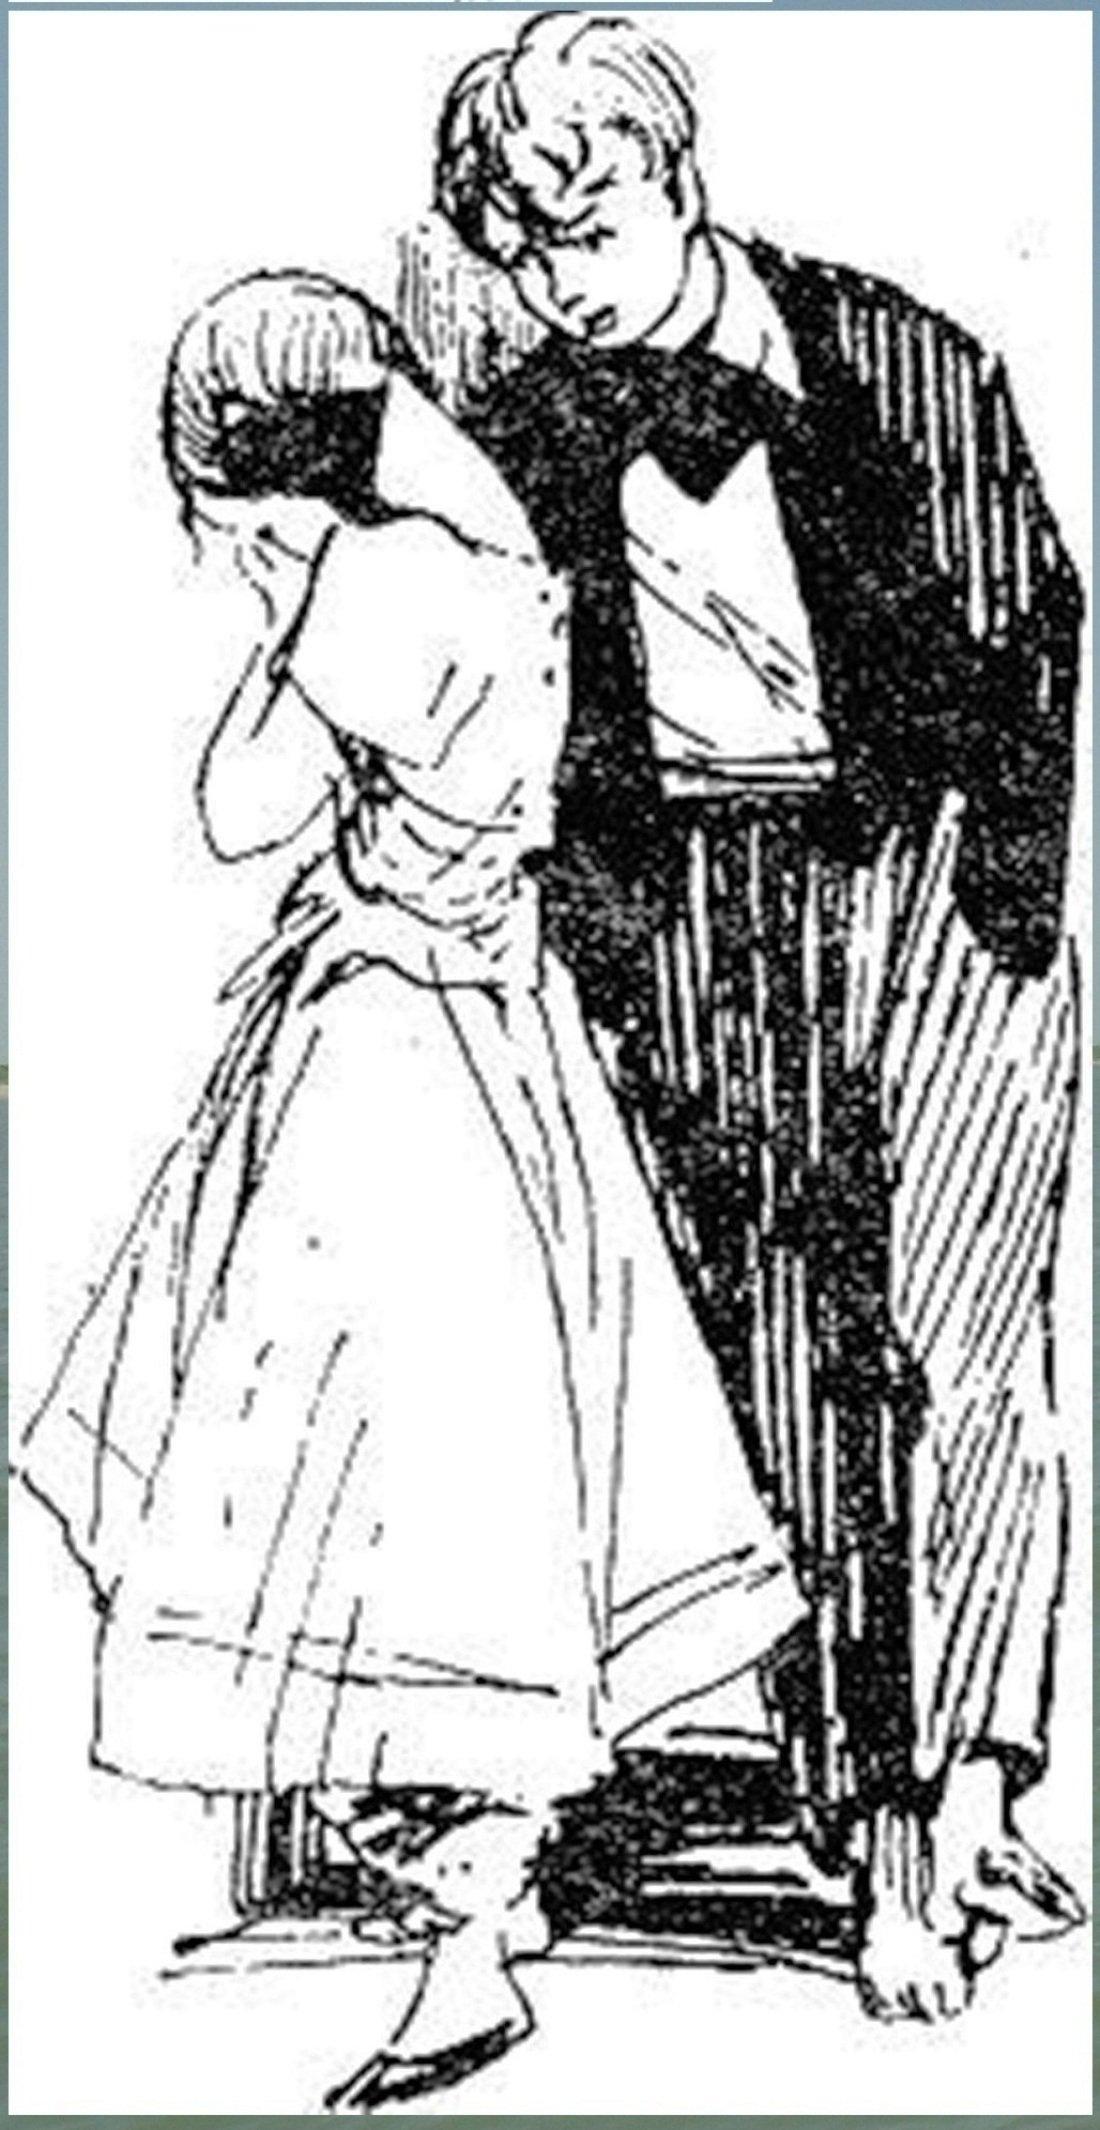 Иллюстрация В. Н. Горяева к пр-ю М.Твена Приключения Тома Сойера (19).